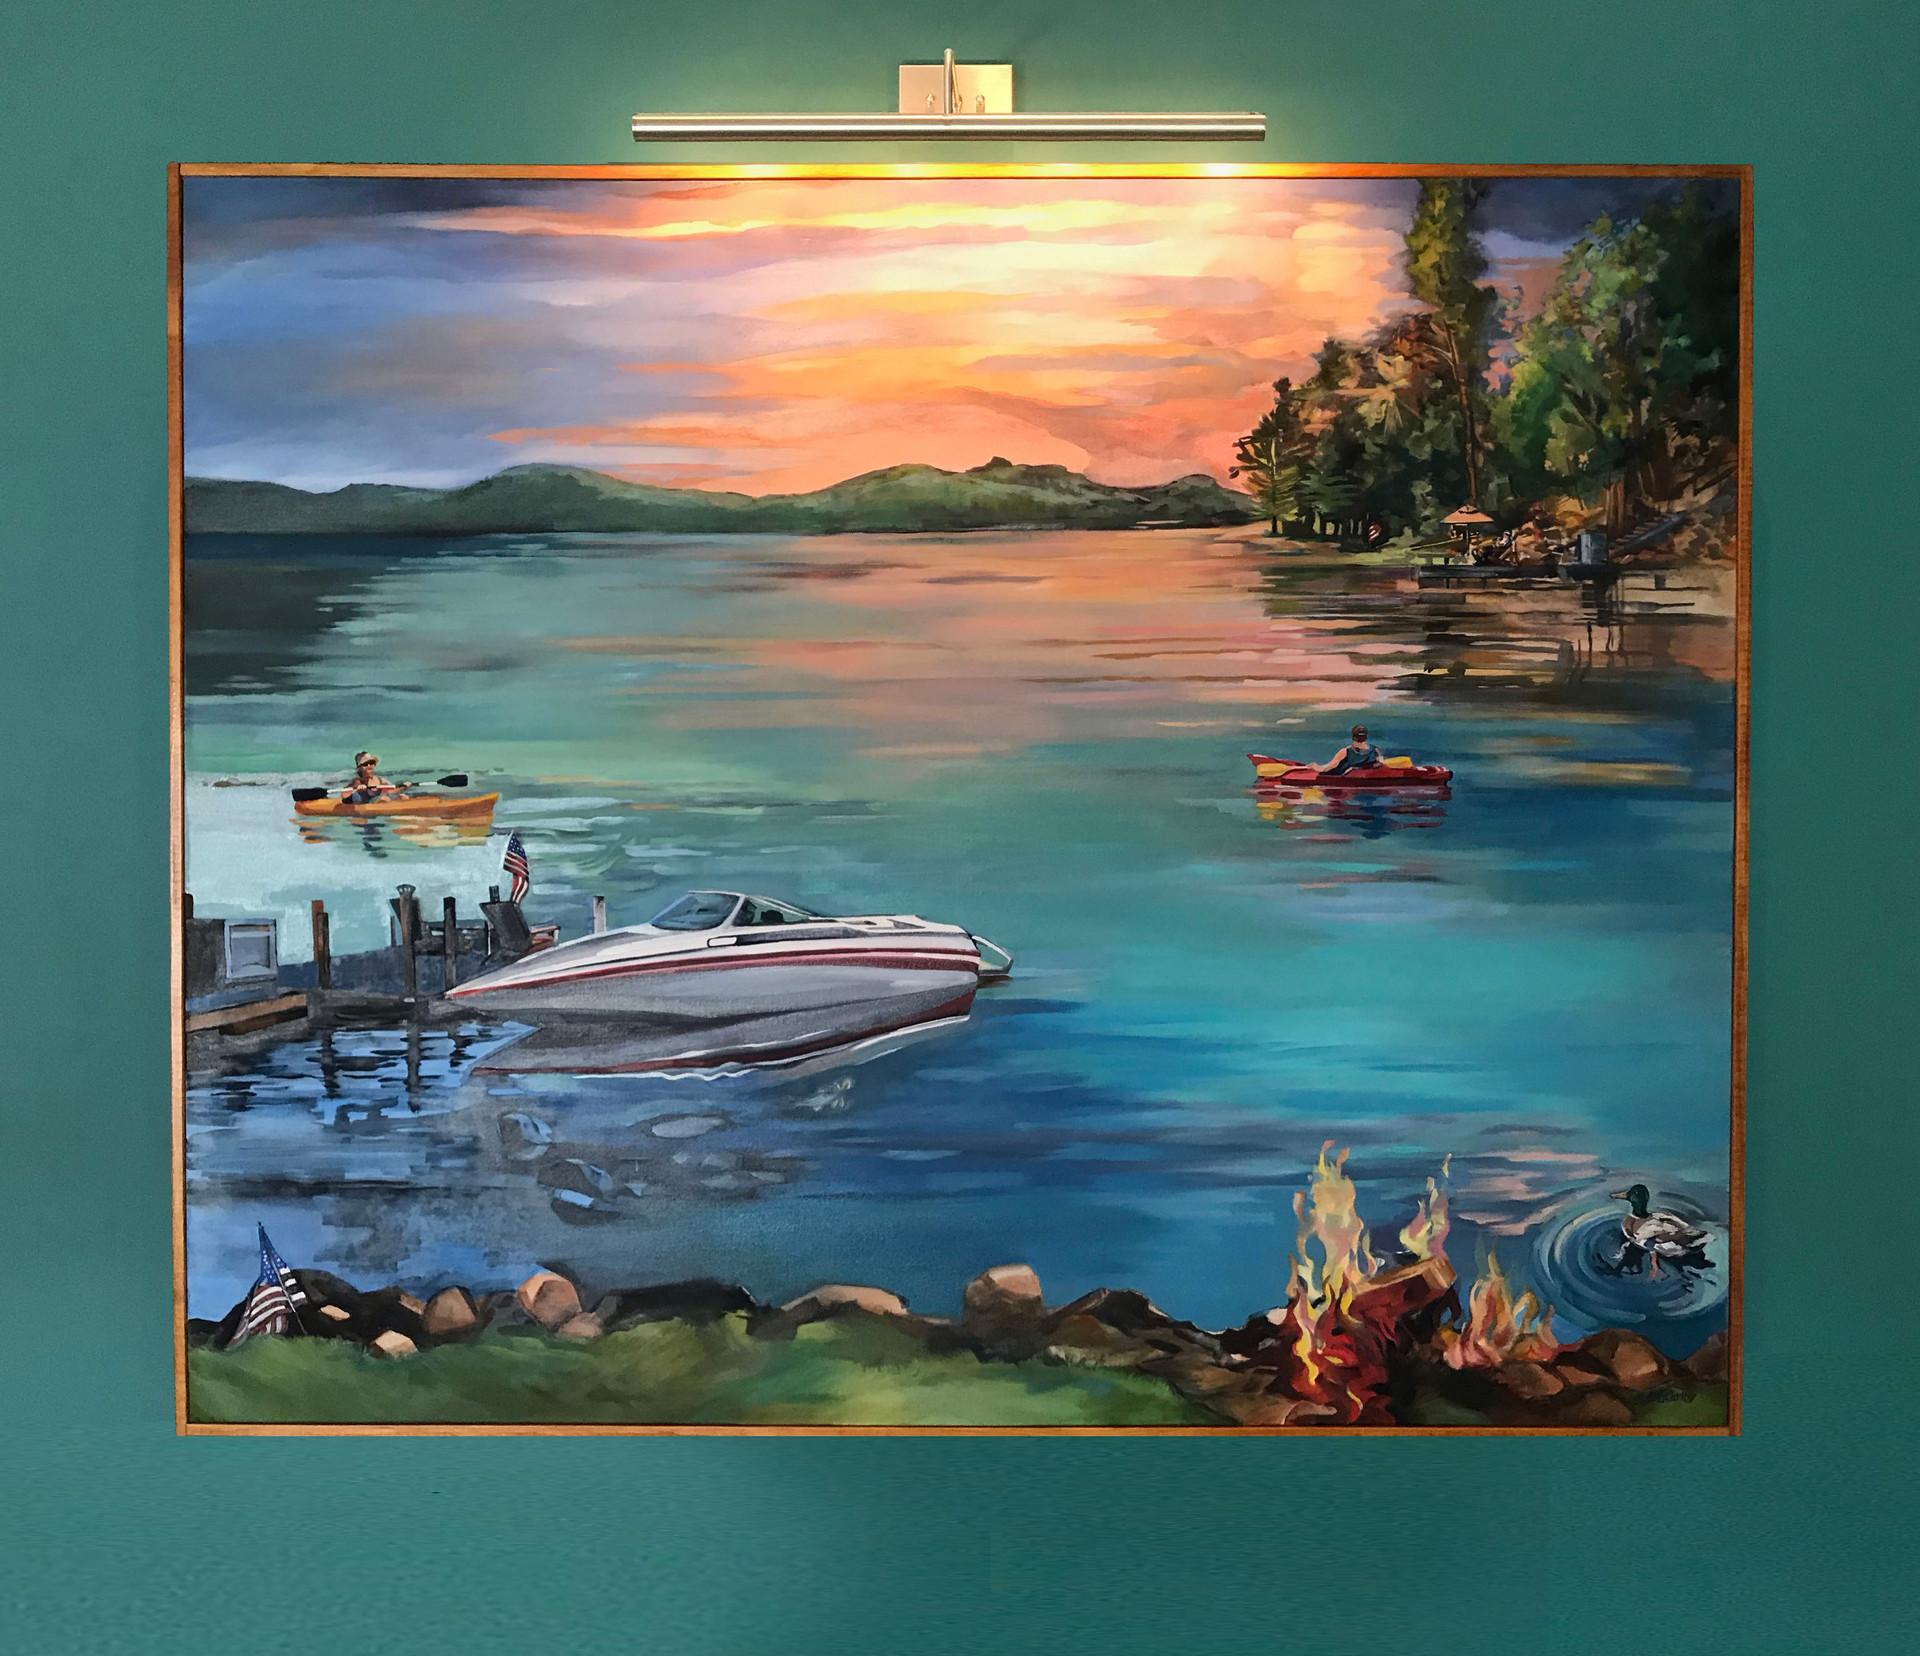 The Great Sacandaga Lake